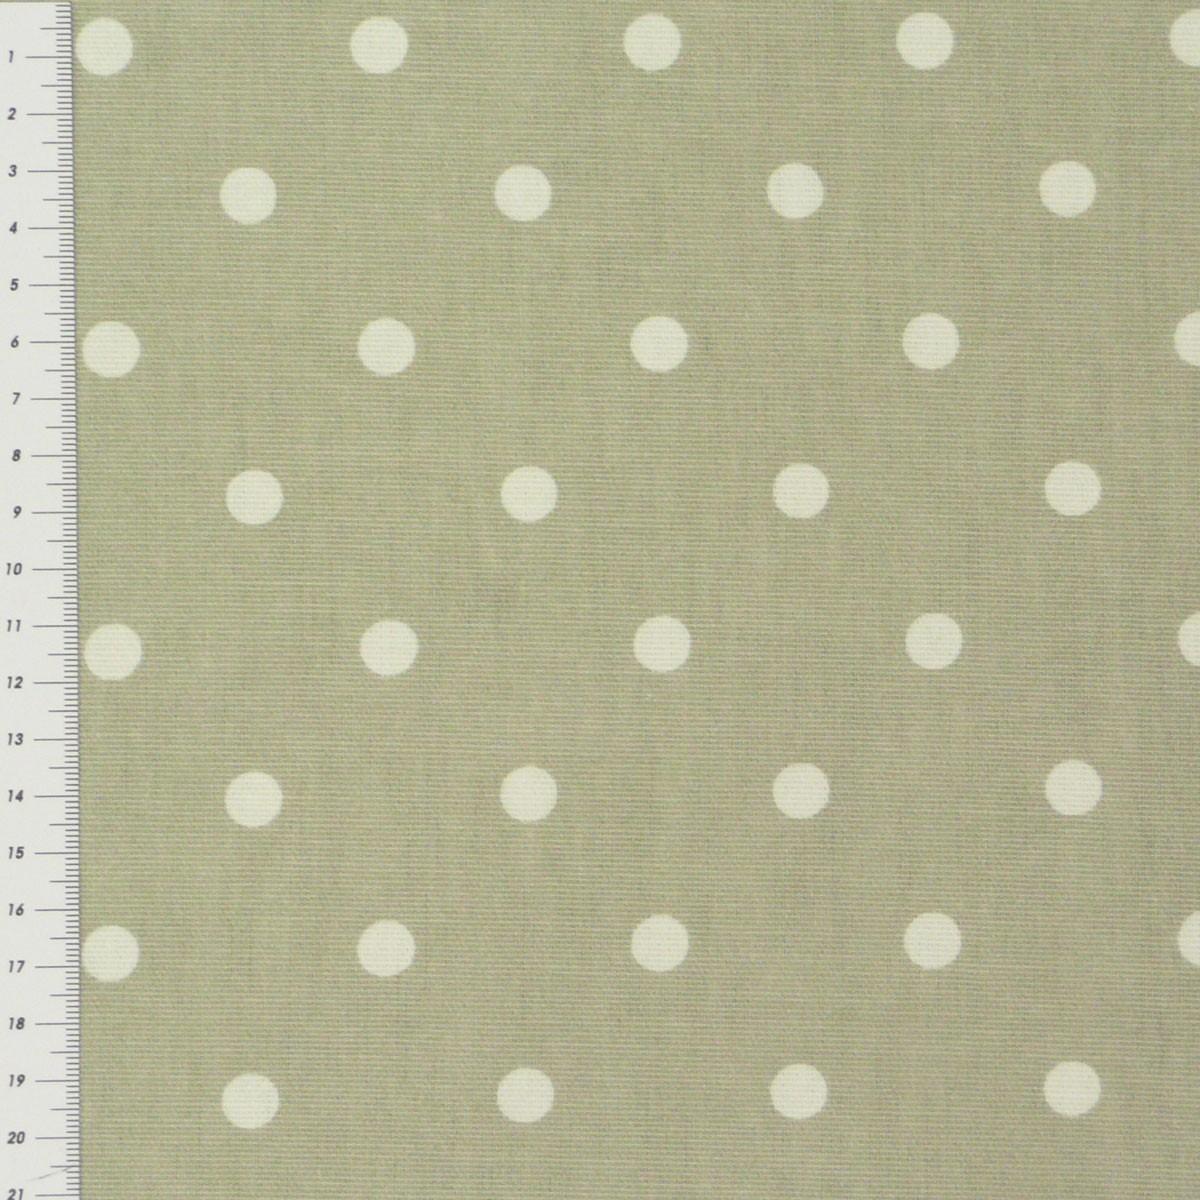 baumwollstoff full stop grau mit wei en punkten gardinenstoff dekostoff stoffe stoffe gemustert. Black Bedroom Furniture Sets. Home Design Ideas